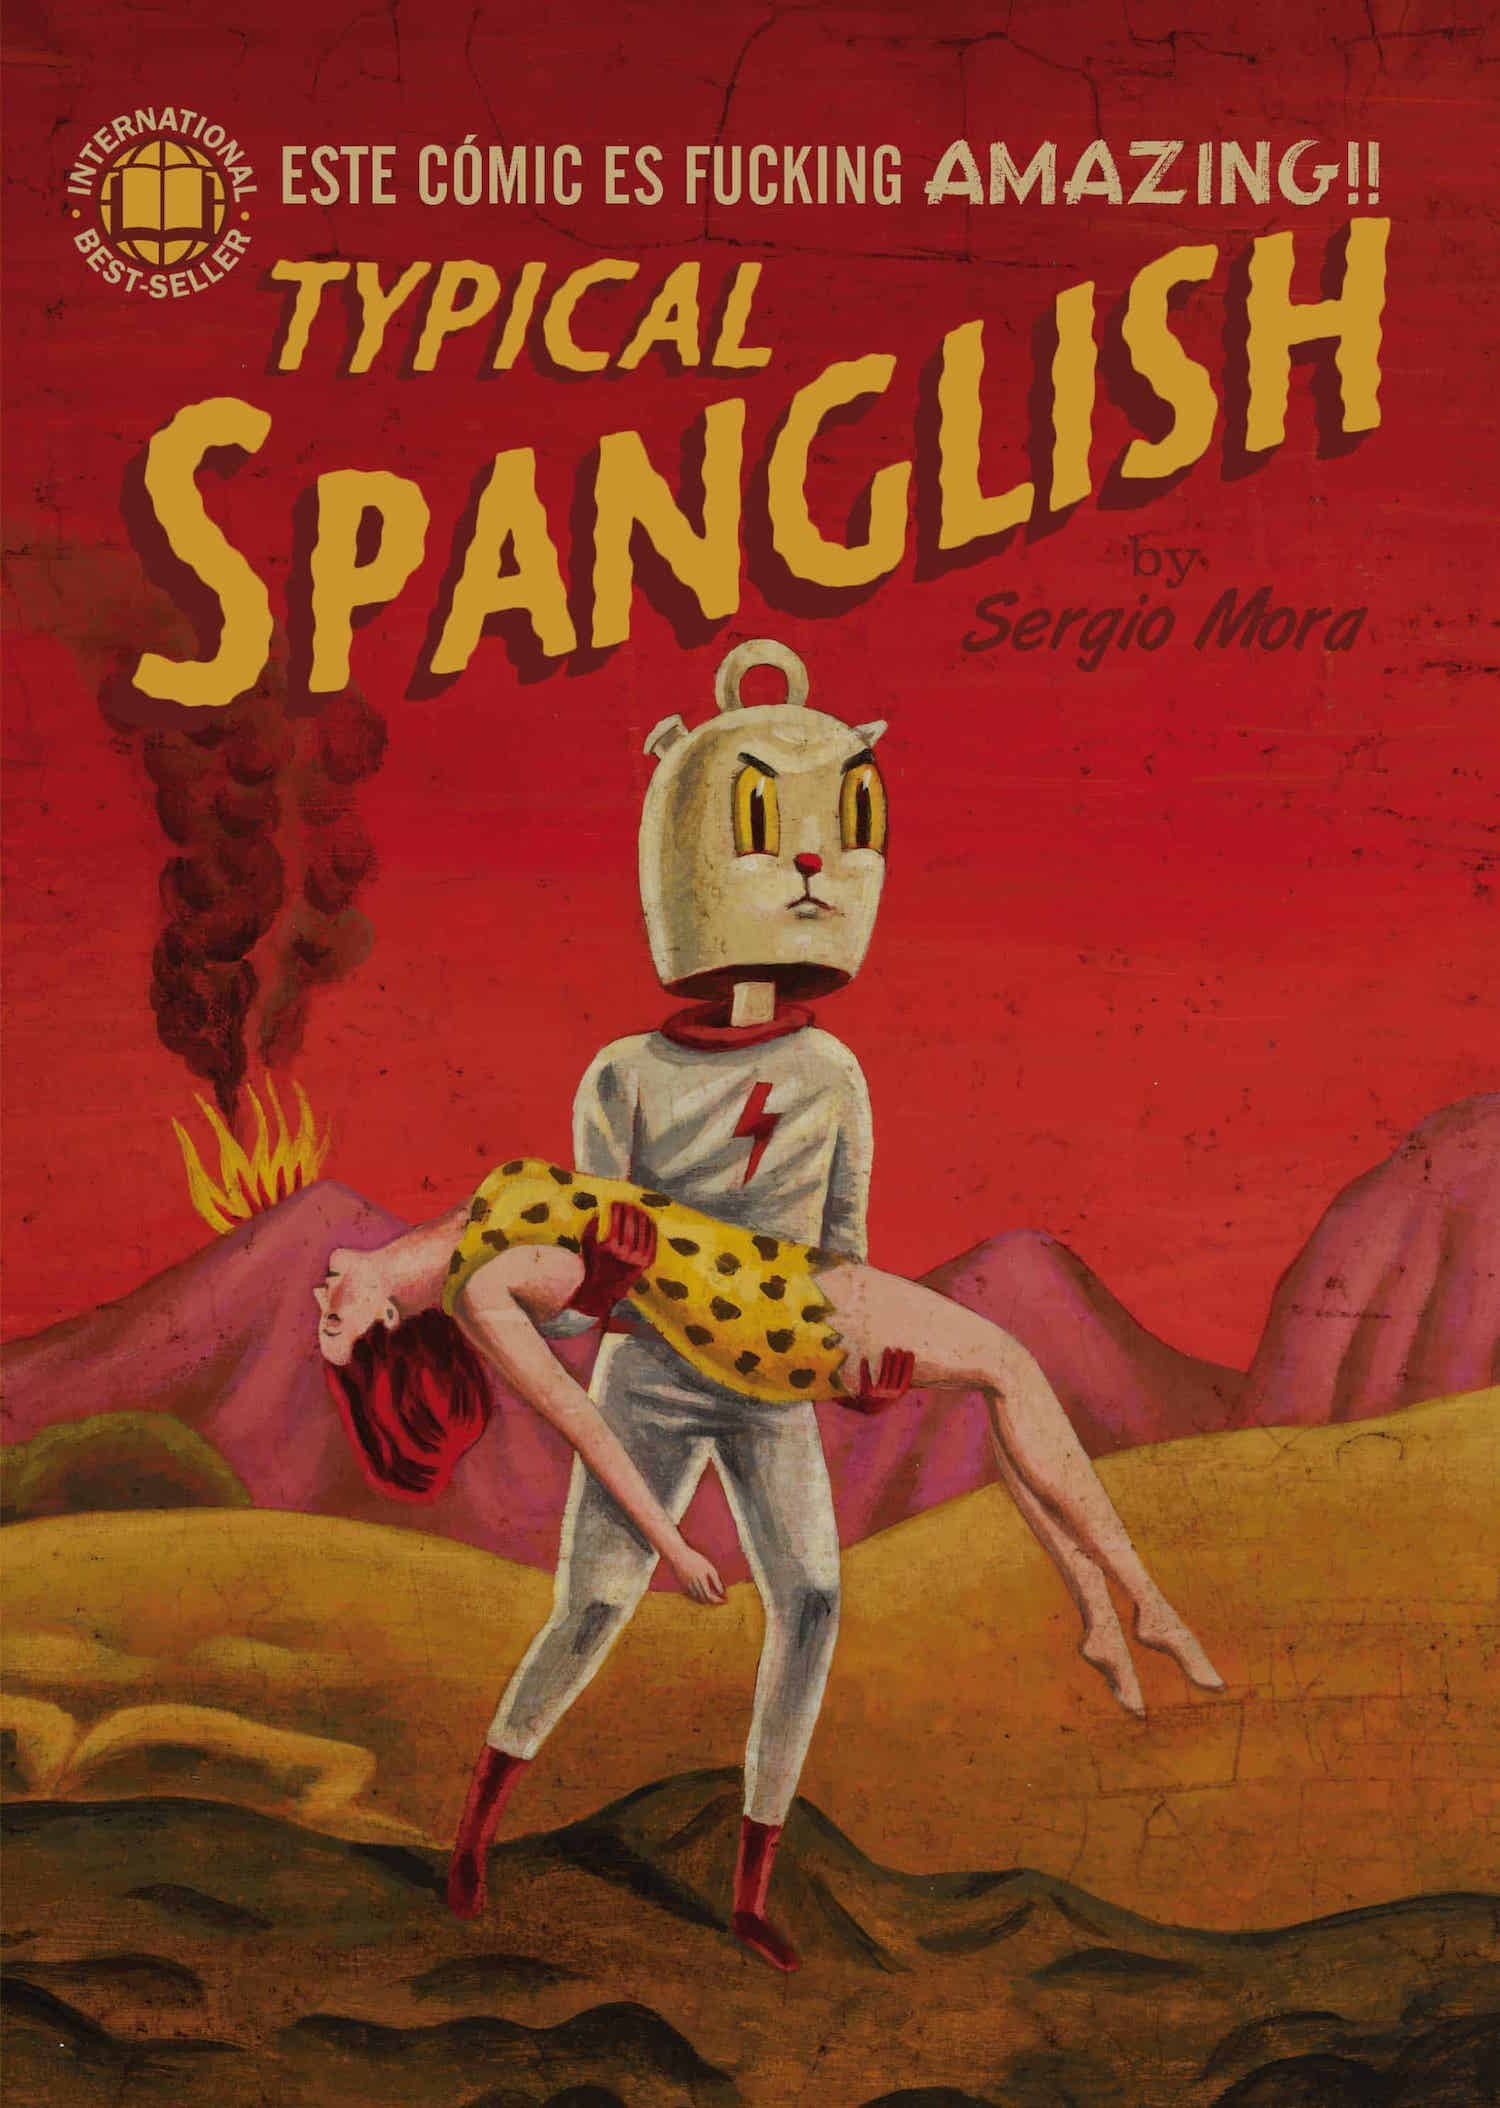 TYPICAL SPANGLISH